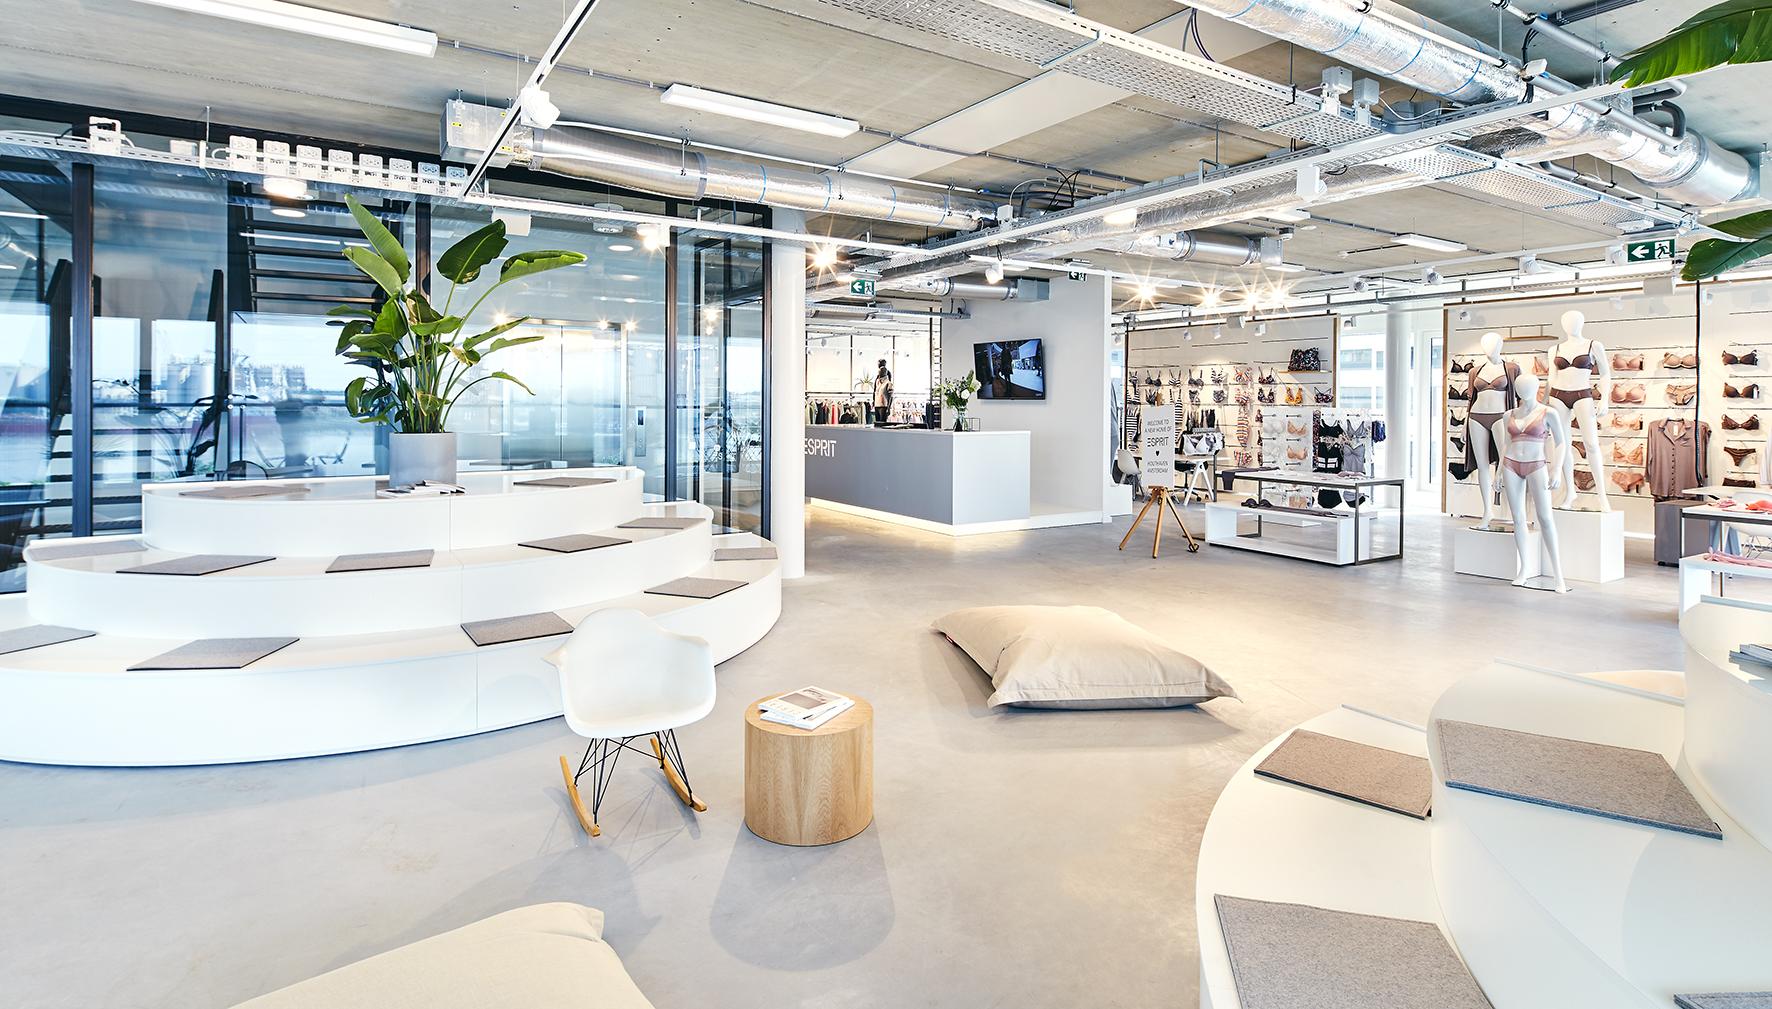 Esprit Showrooms Amsterdam_photographer M.Hofmans_June 19_1